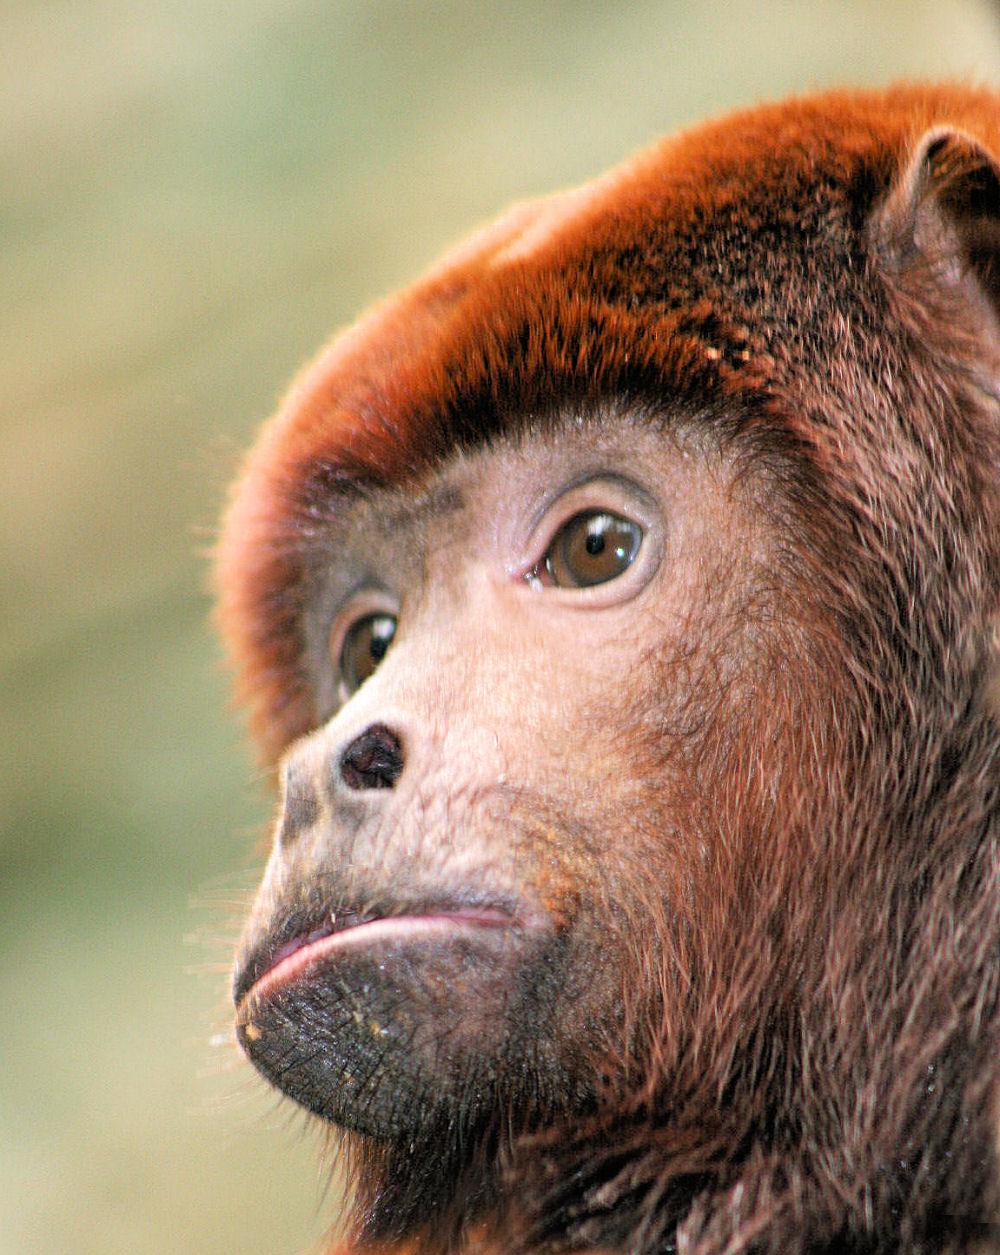 Male Howler monkey, Dallas World Aquarium, Dallas, Texas